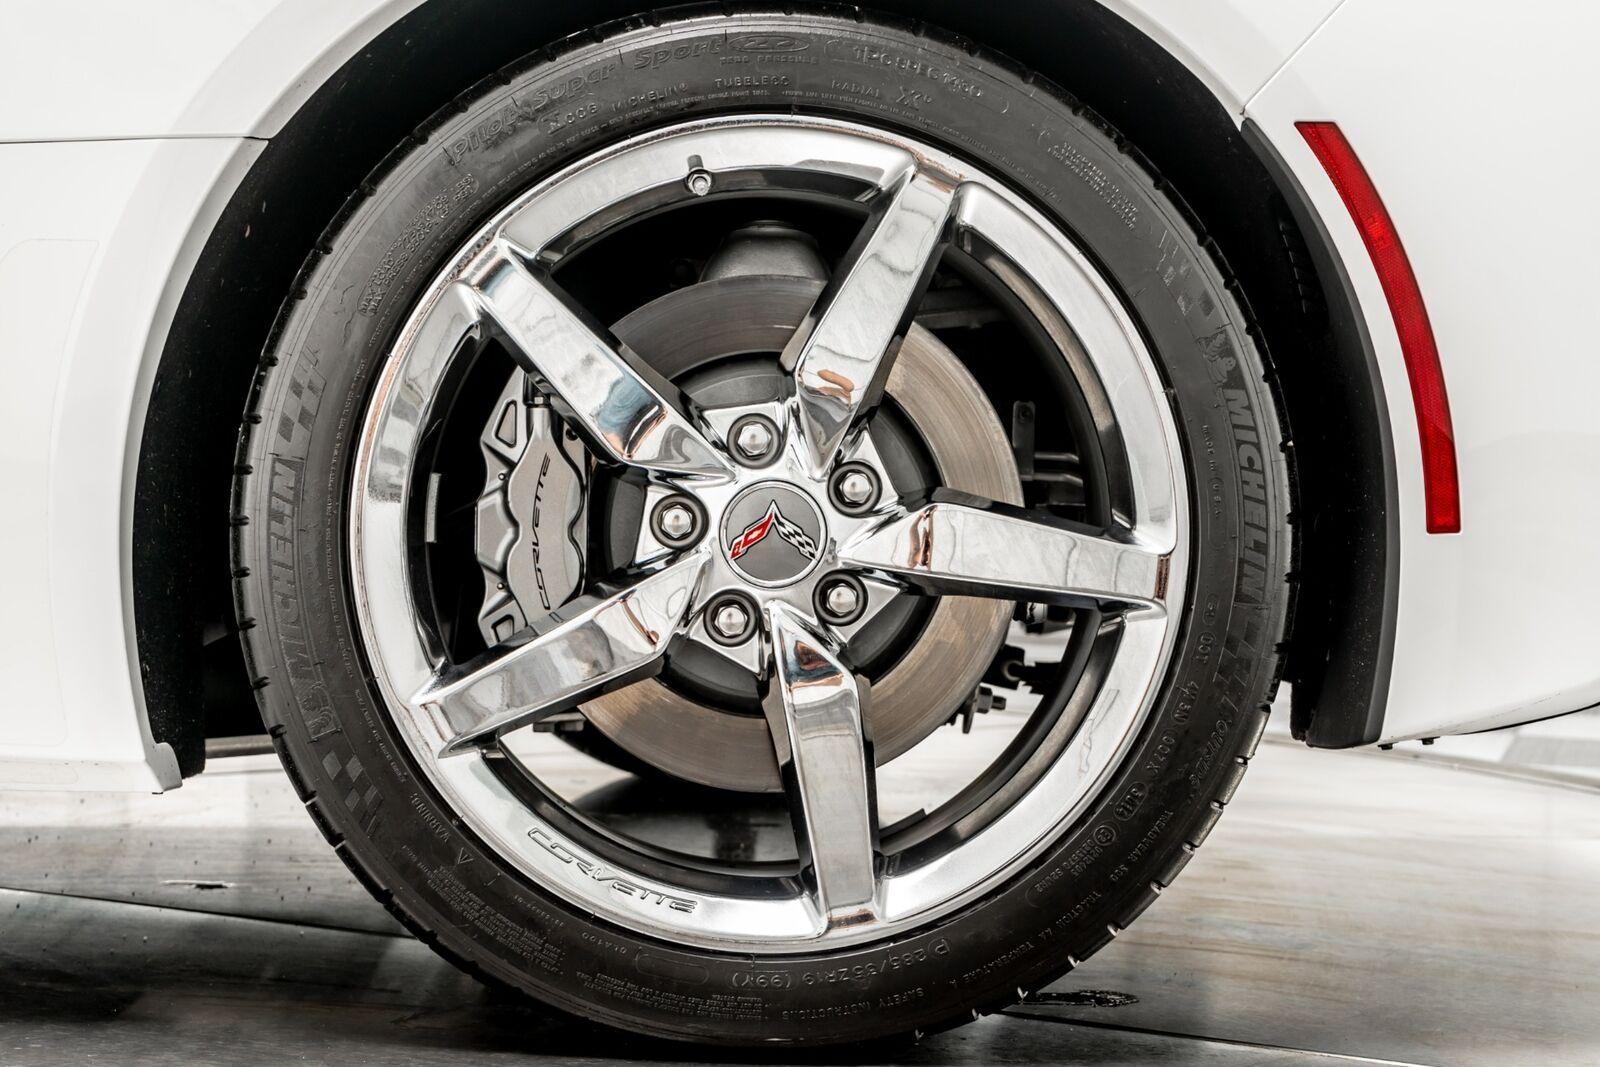 2015 White Chevrolet Corvette Convertible 3LT   C7 Corvette Photo 10